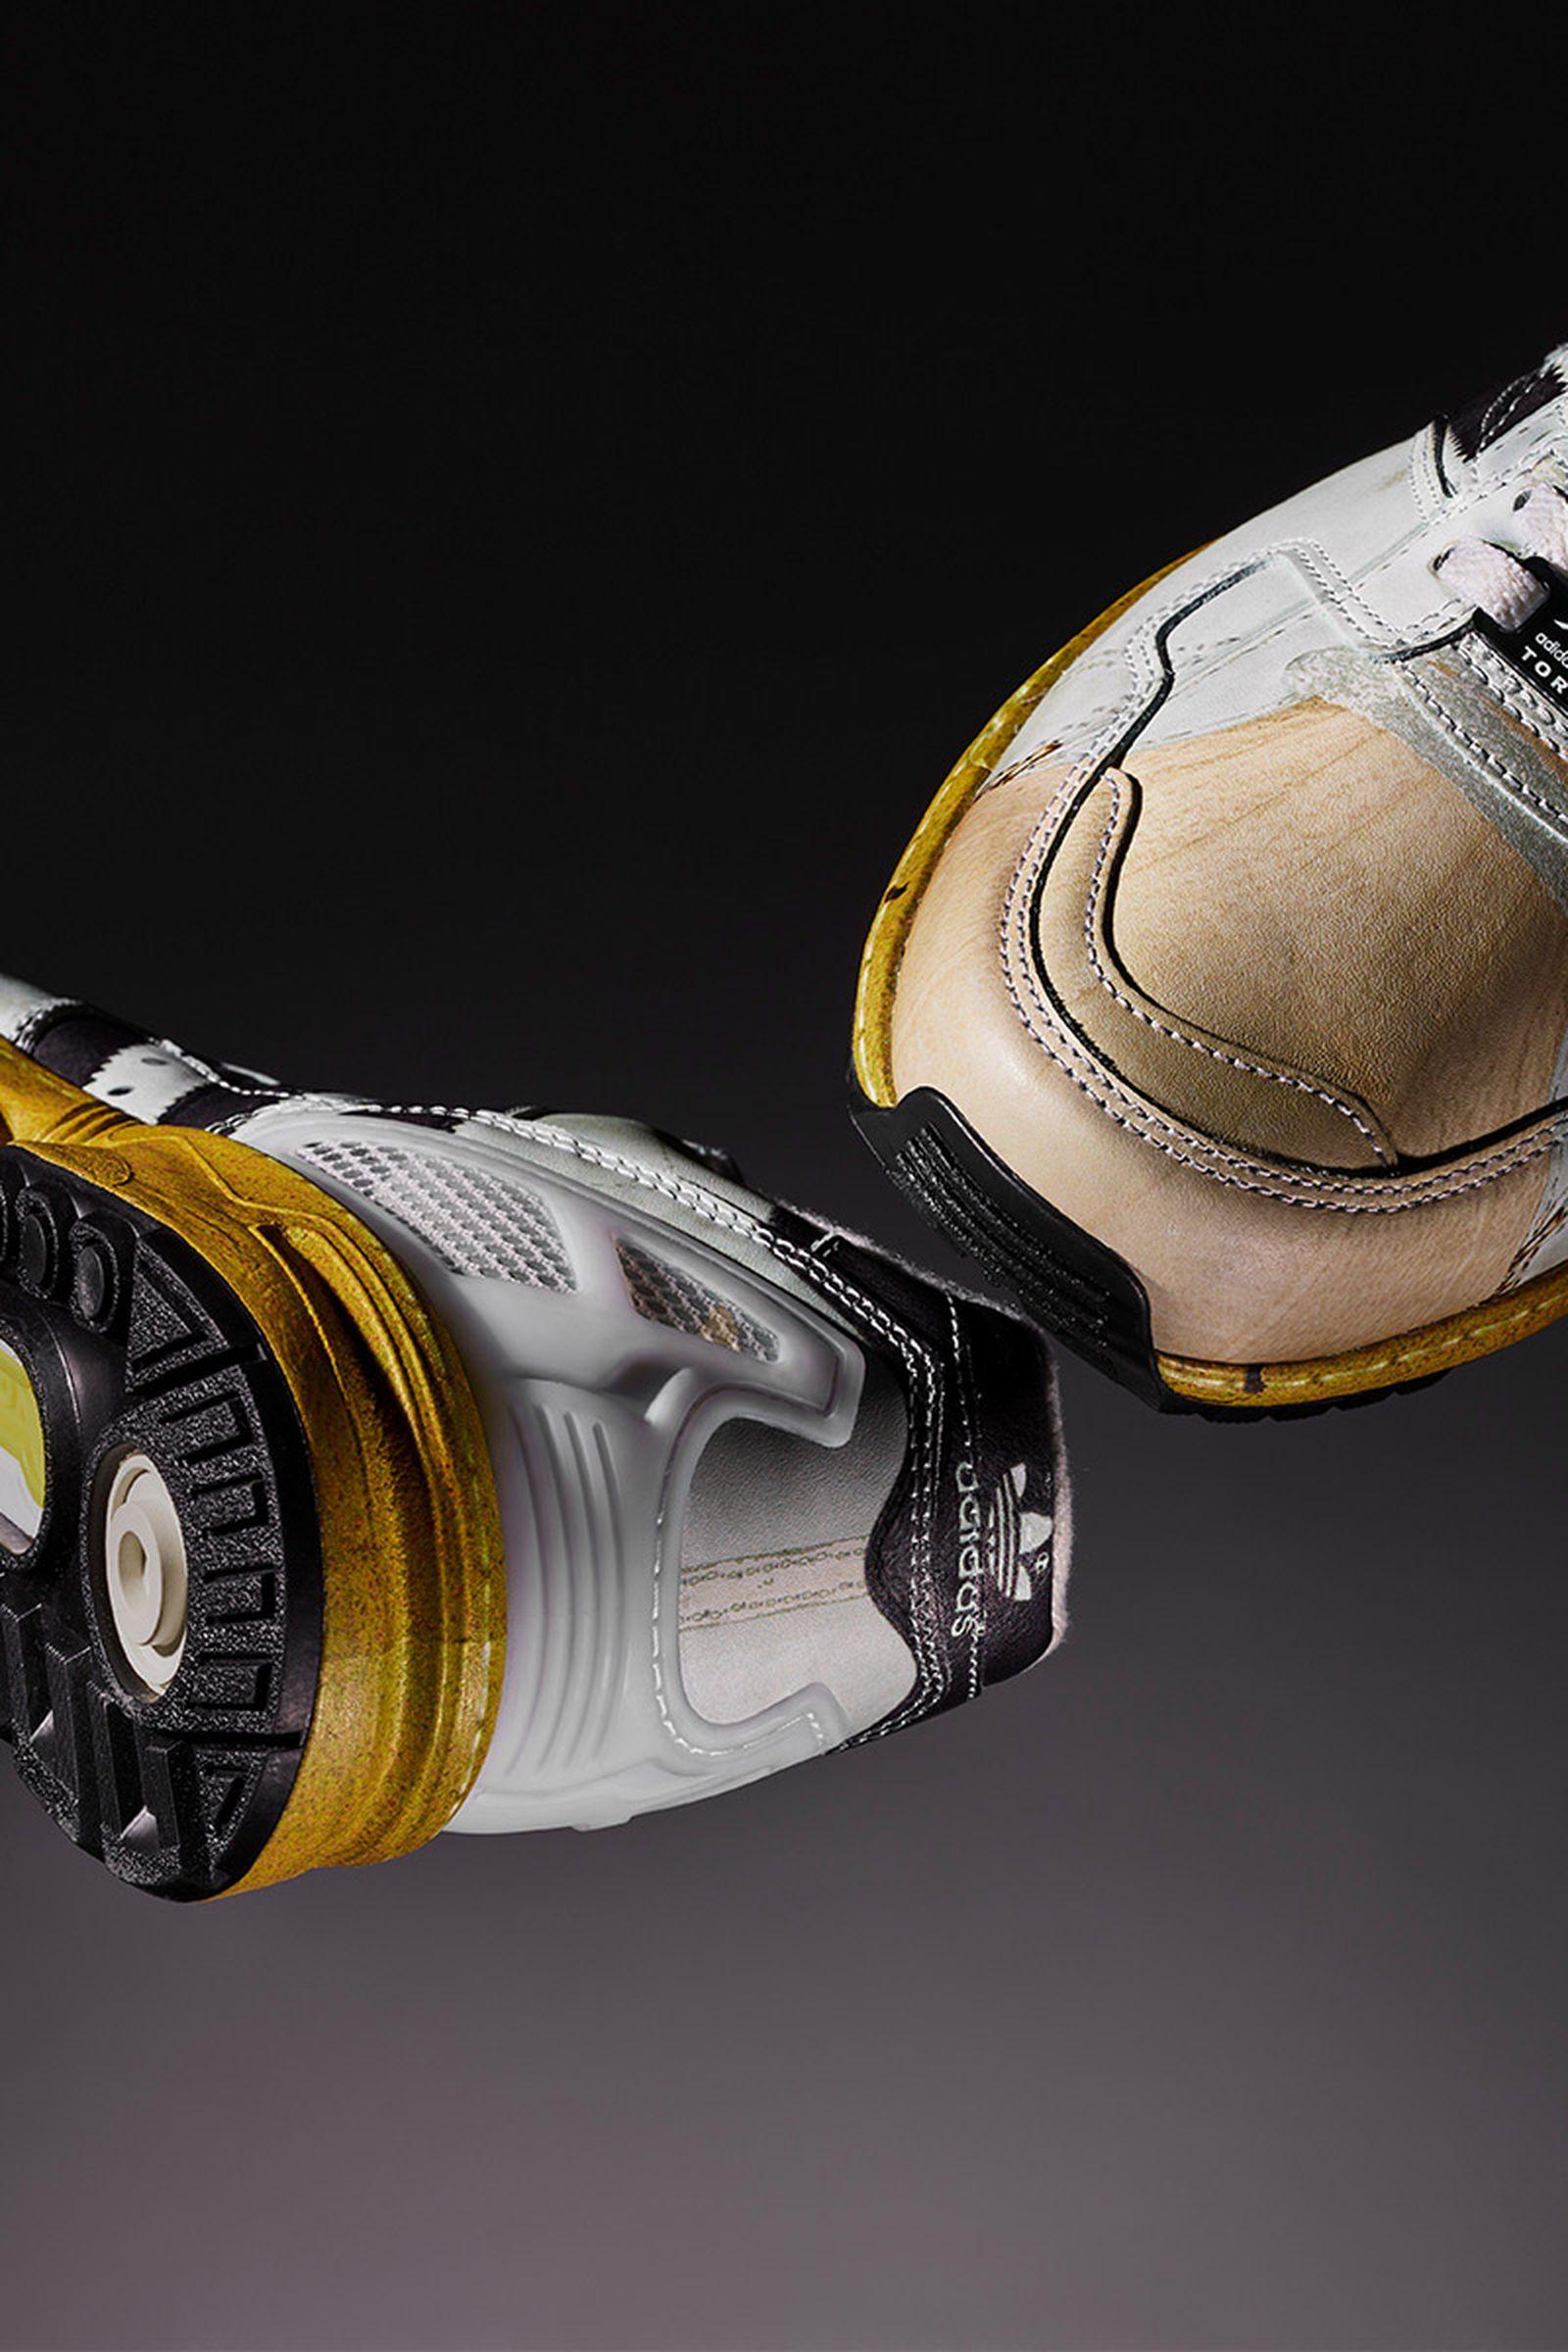 adidas-zx-8000-superstar-release-date-price-05